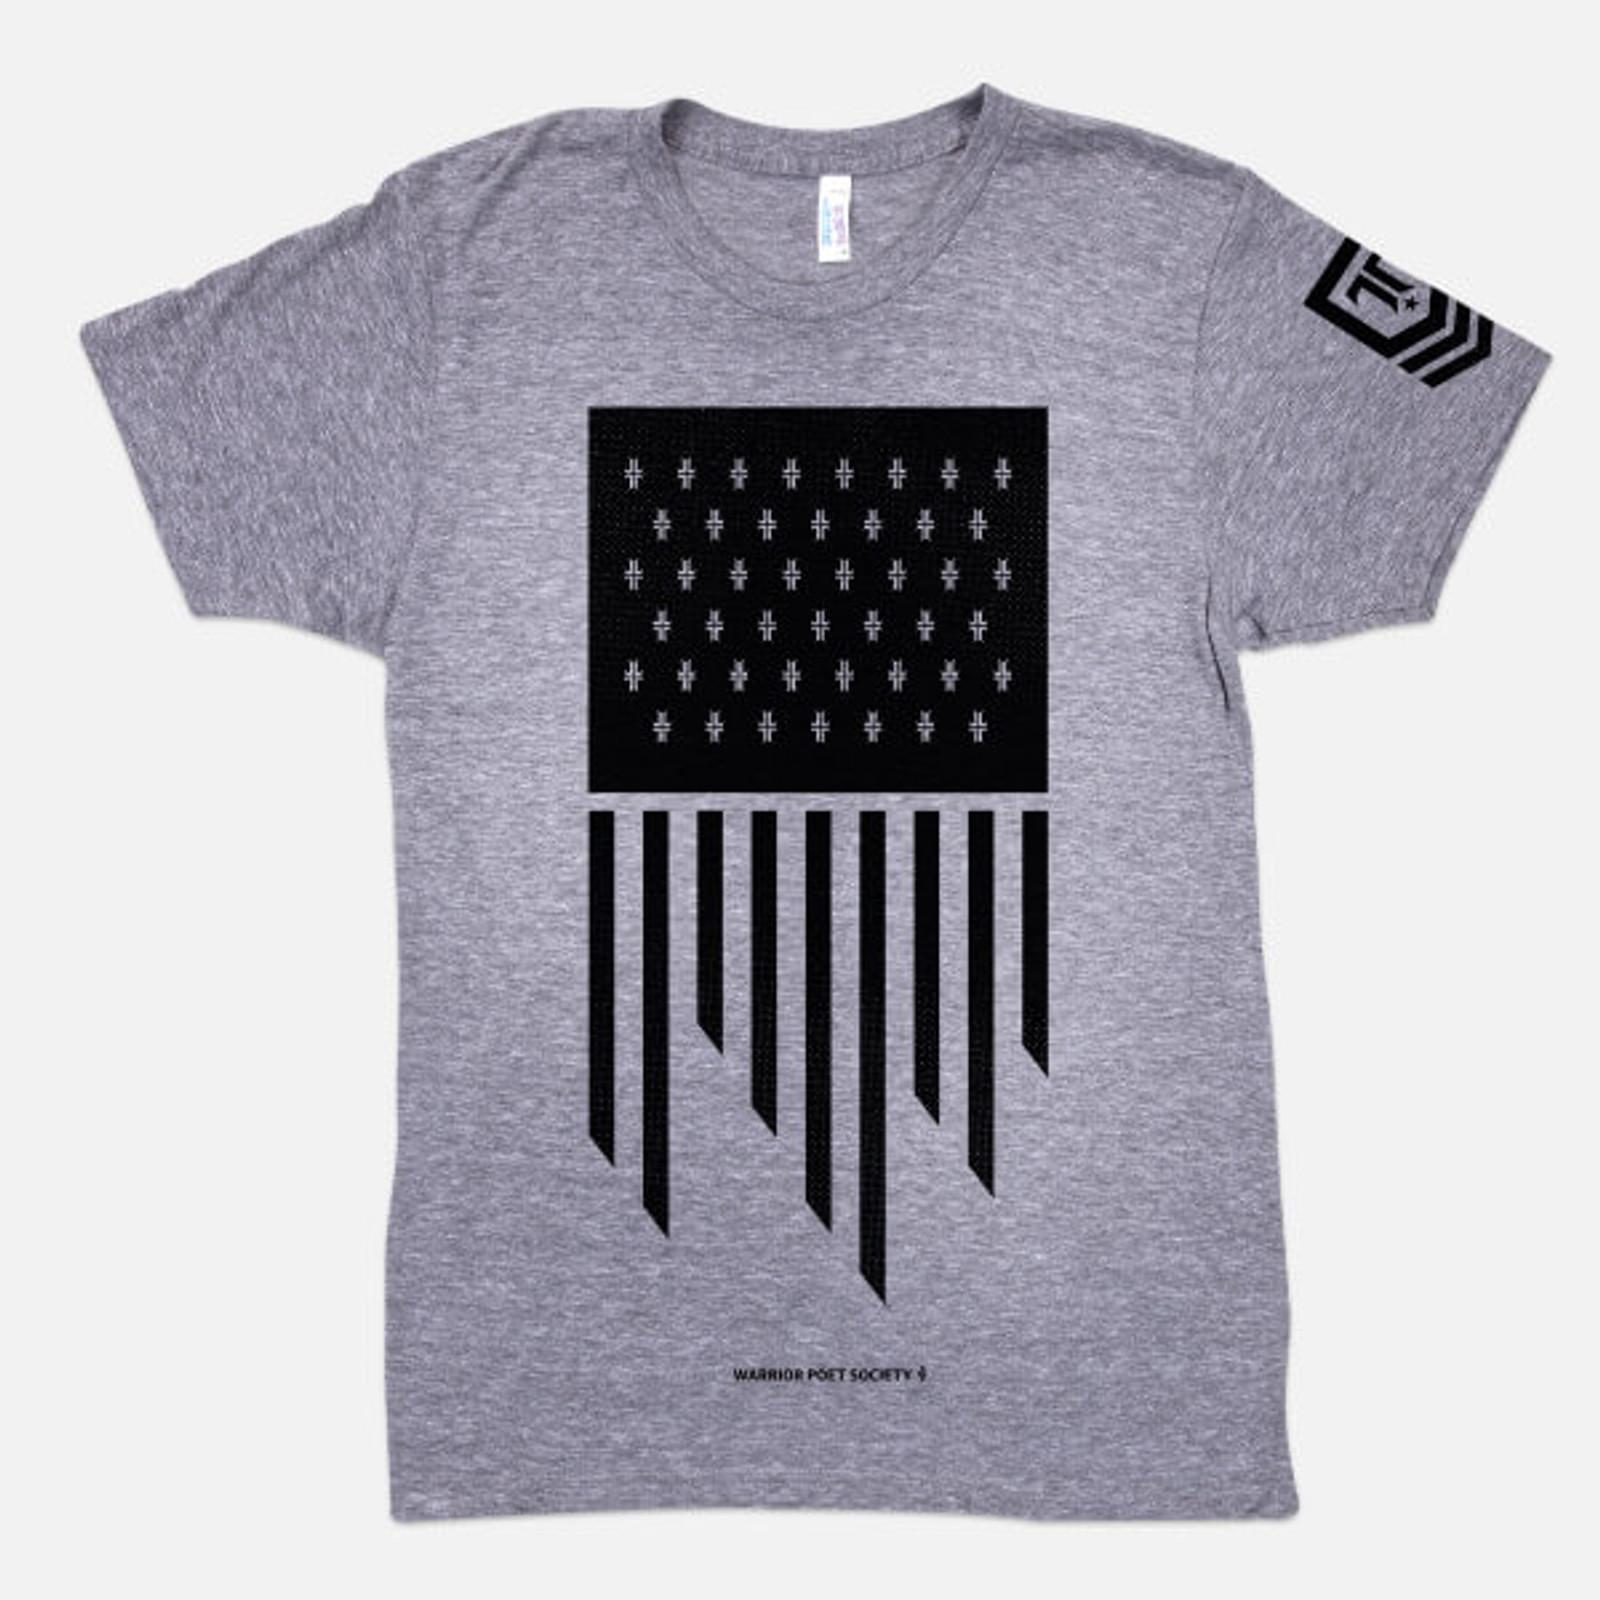 Flag T-Shirt - Grey / Black